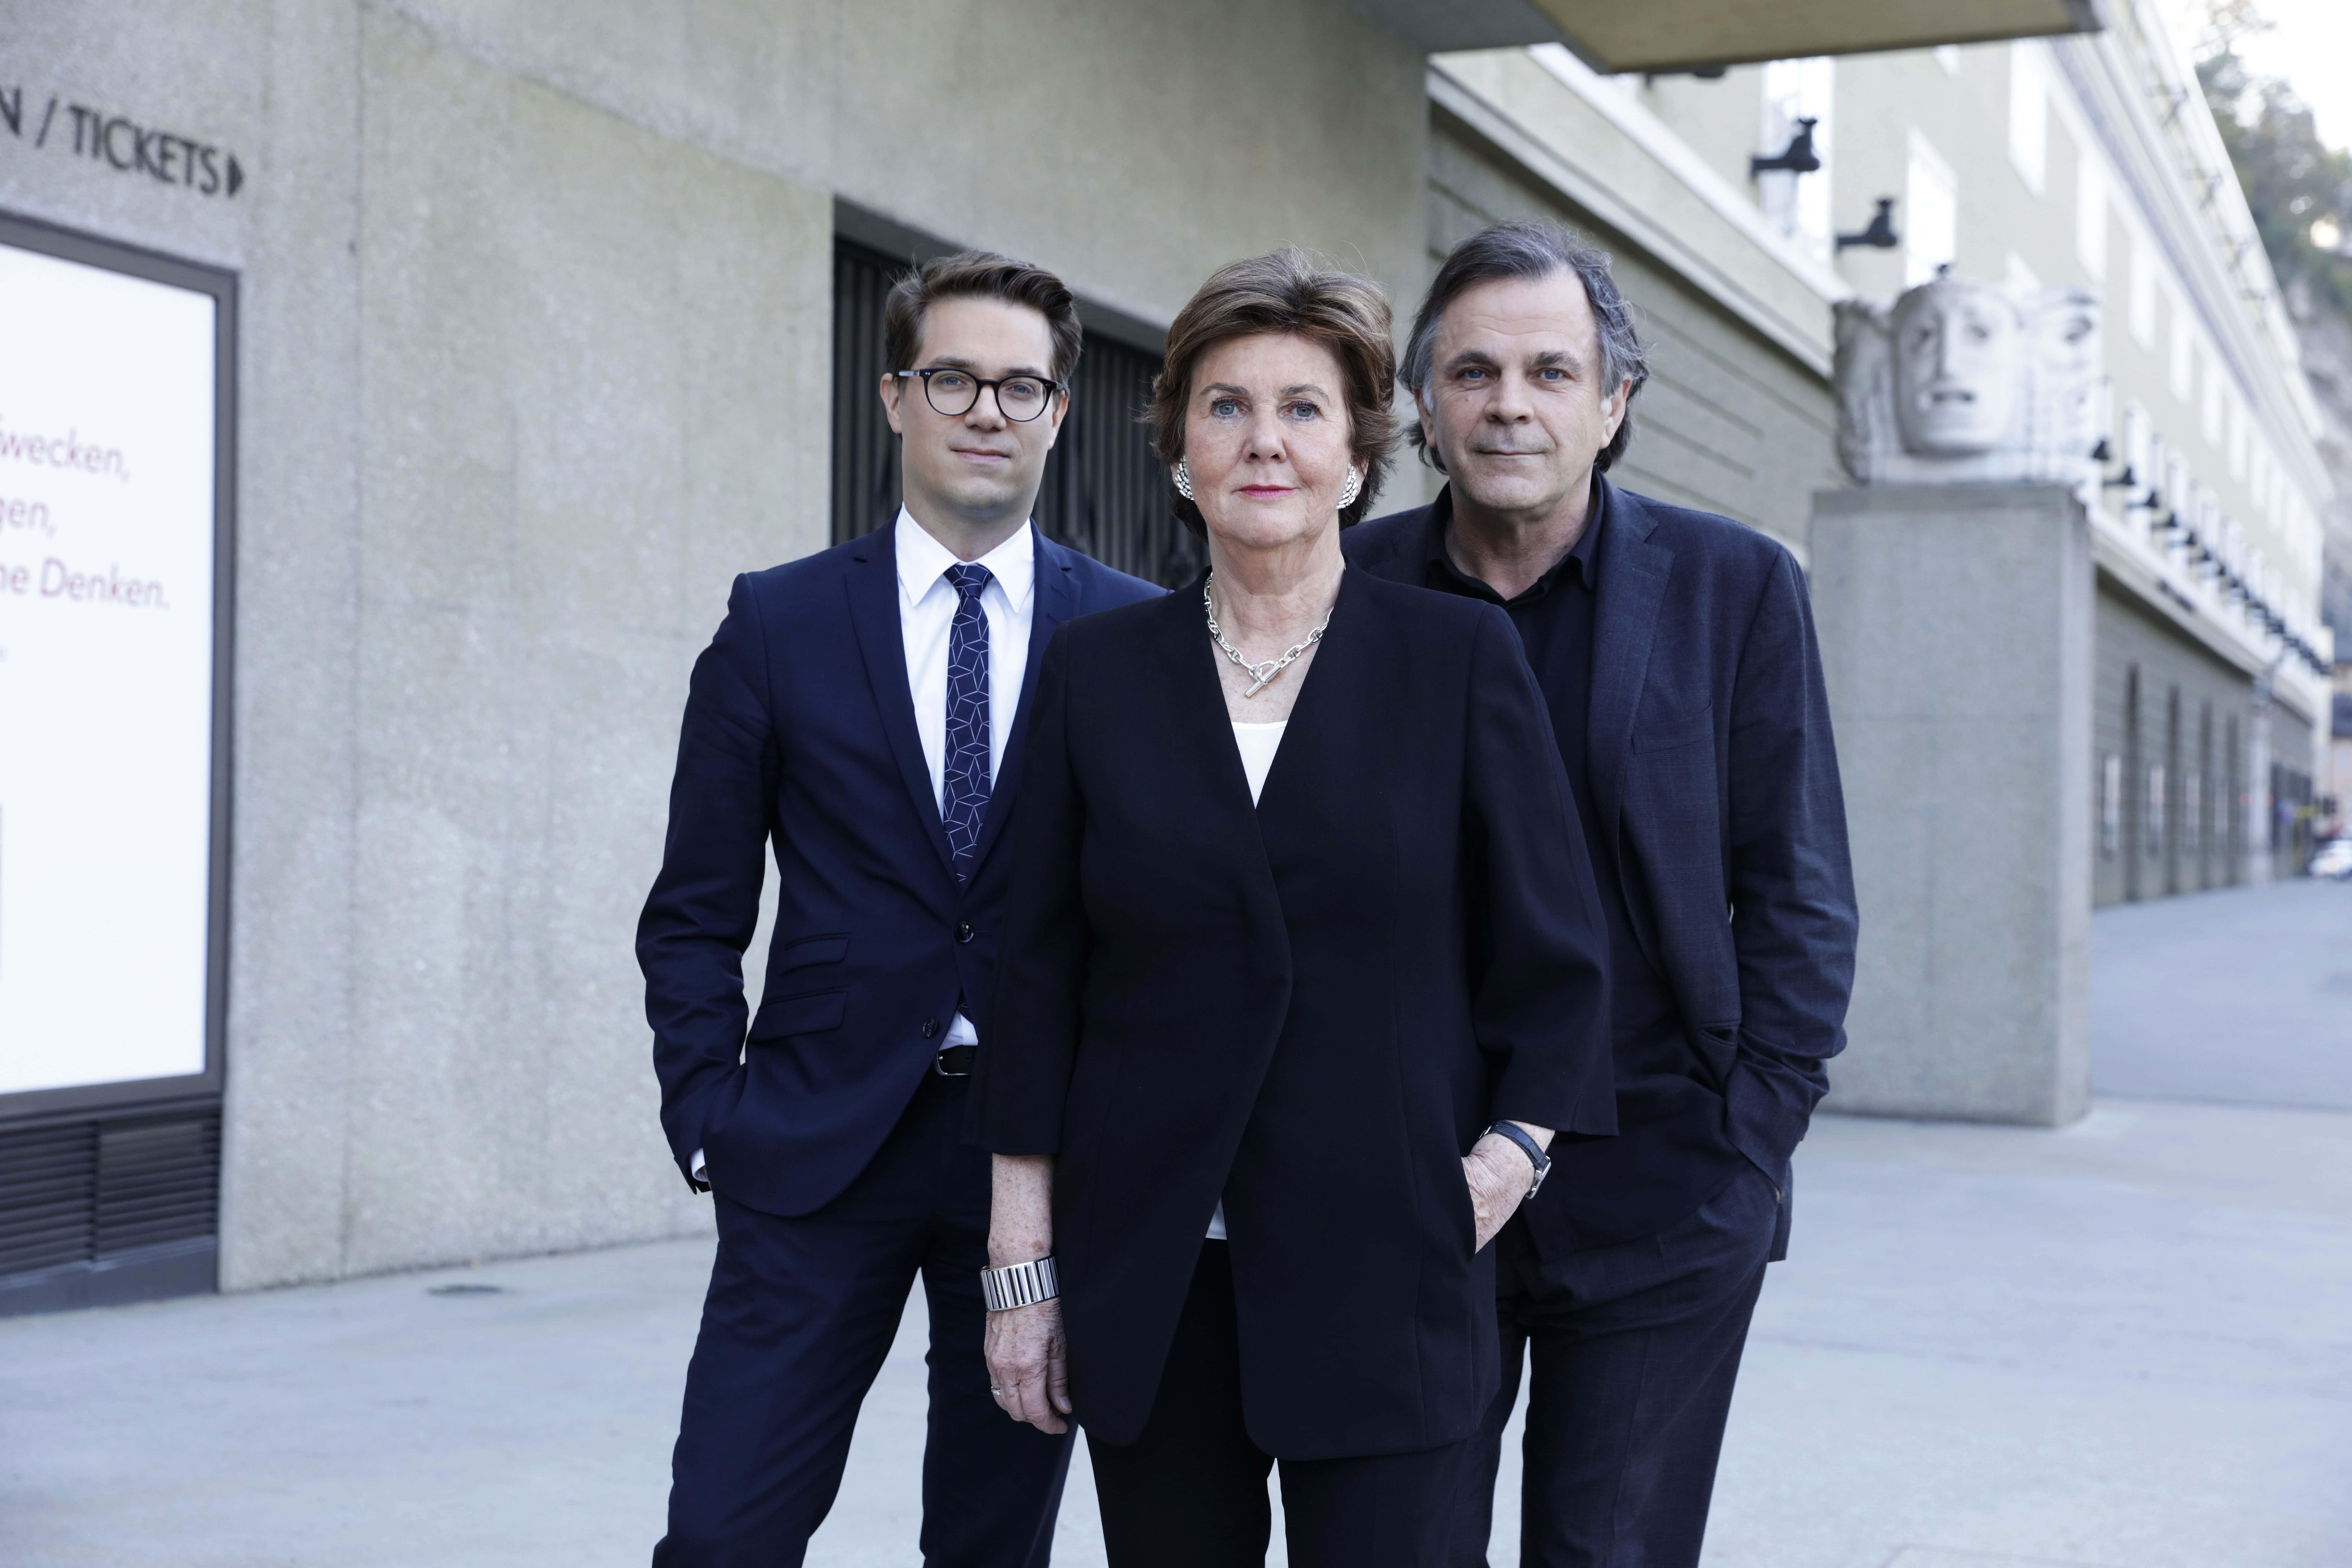 Salzburger Festspiele Direktorium Lukas Crepaz Helga Rabl-Stadler Markus Hinterhäuser